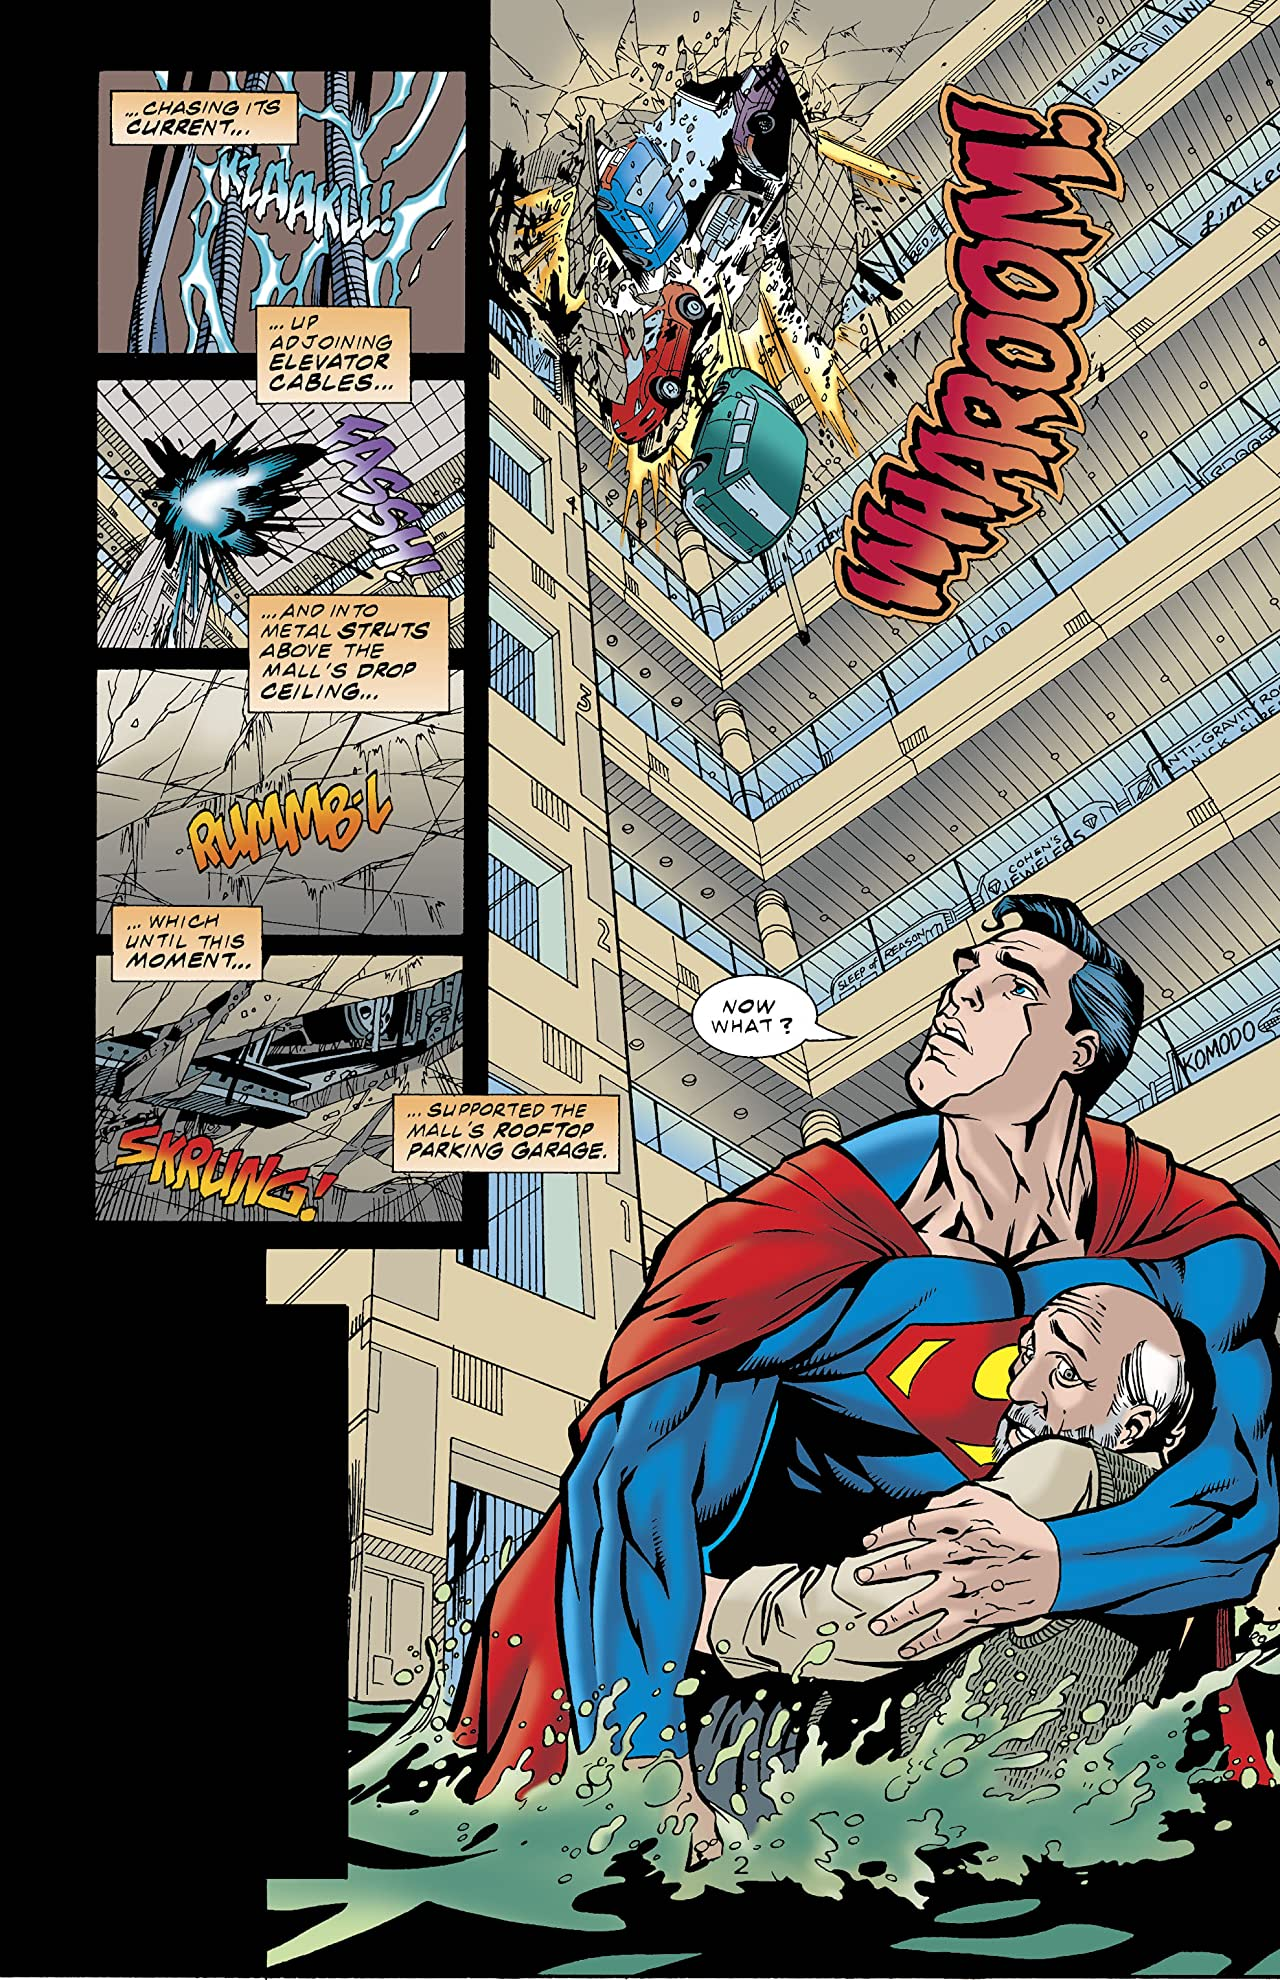 Superman Plus Legion of Super-Heroes (1996) #1